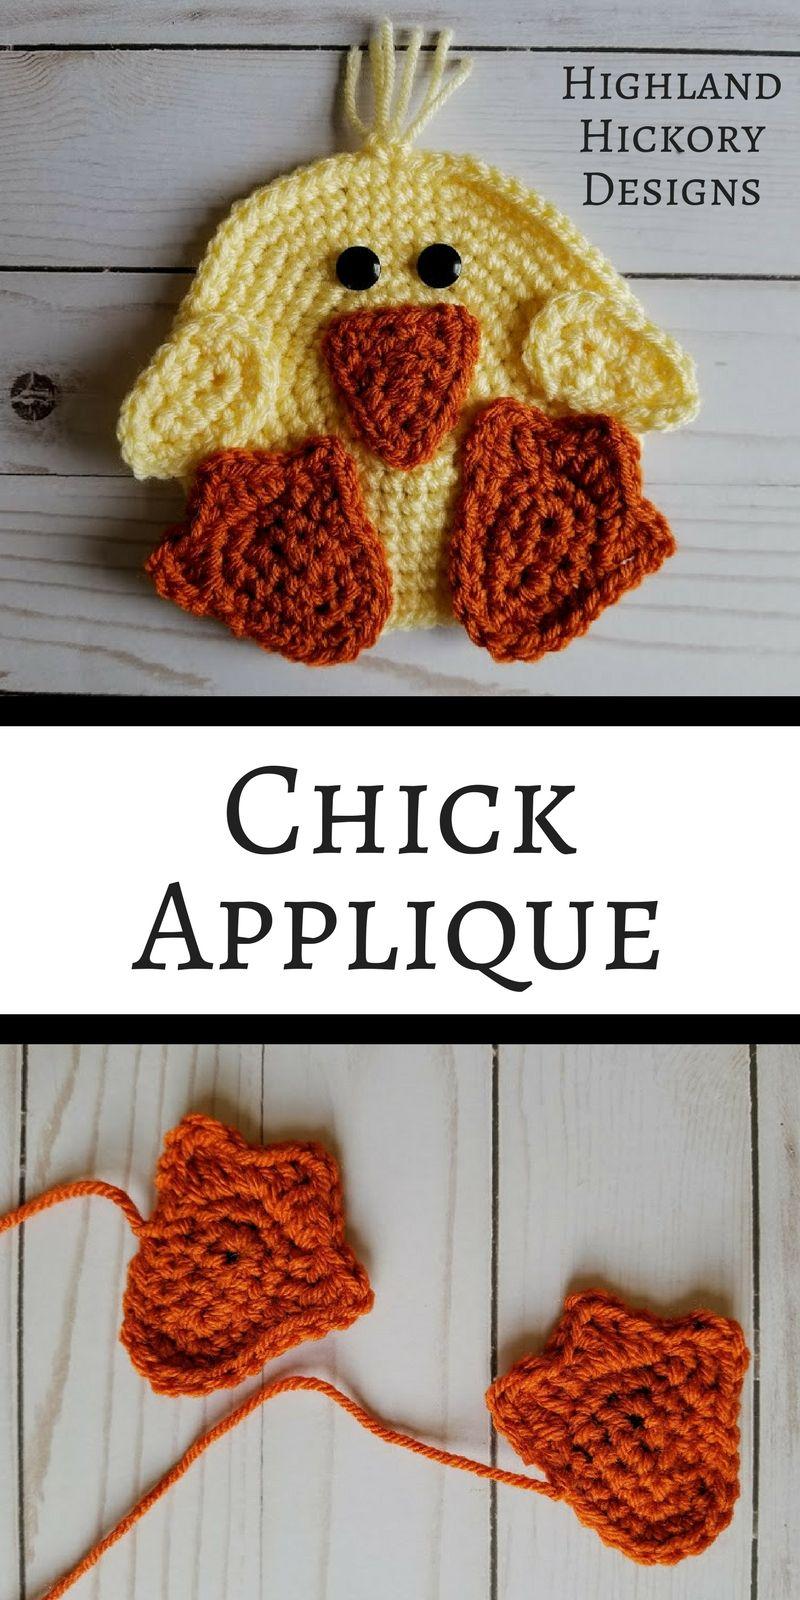 Chick Applique - Free Crochet Pattern   Crochet   Pinterest   Motivo ...